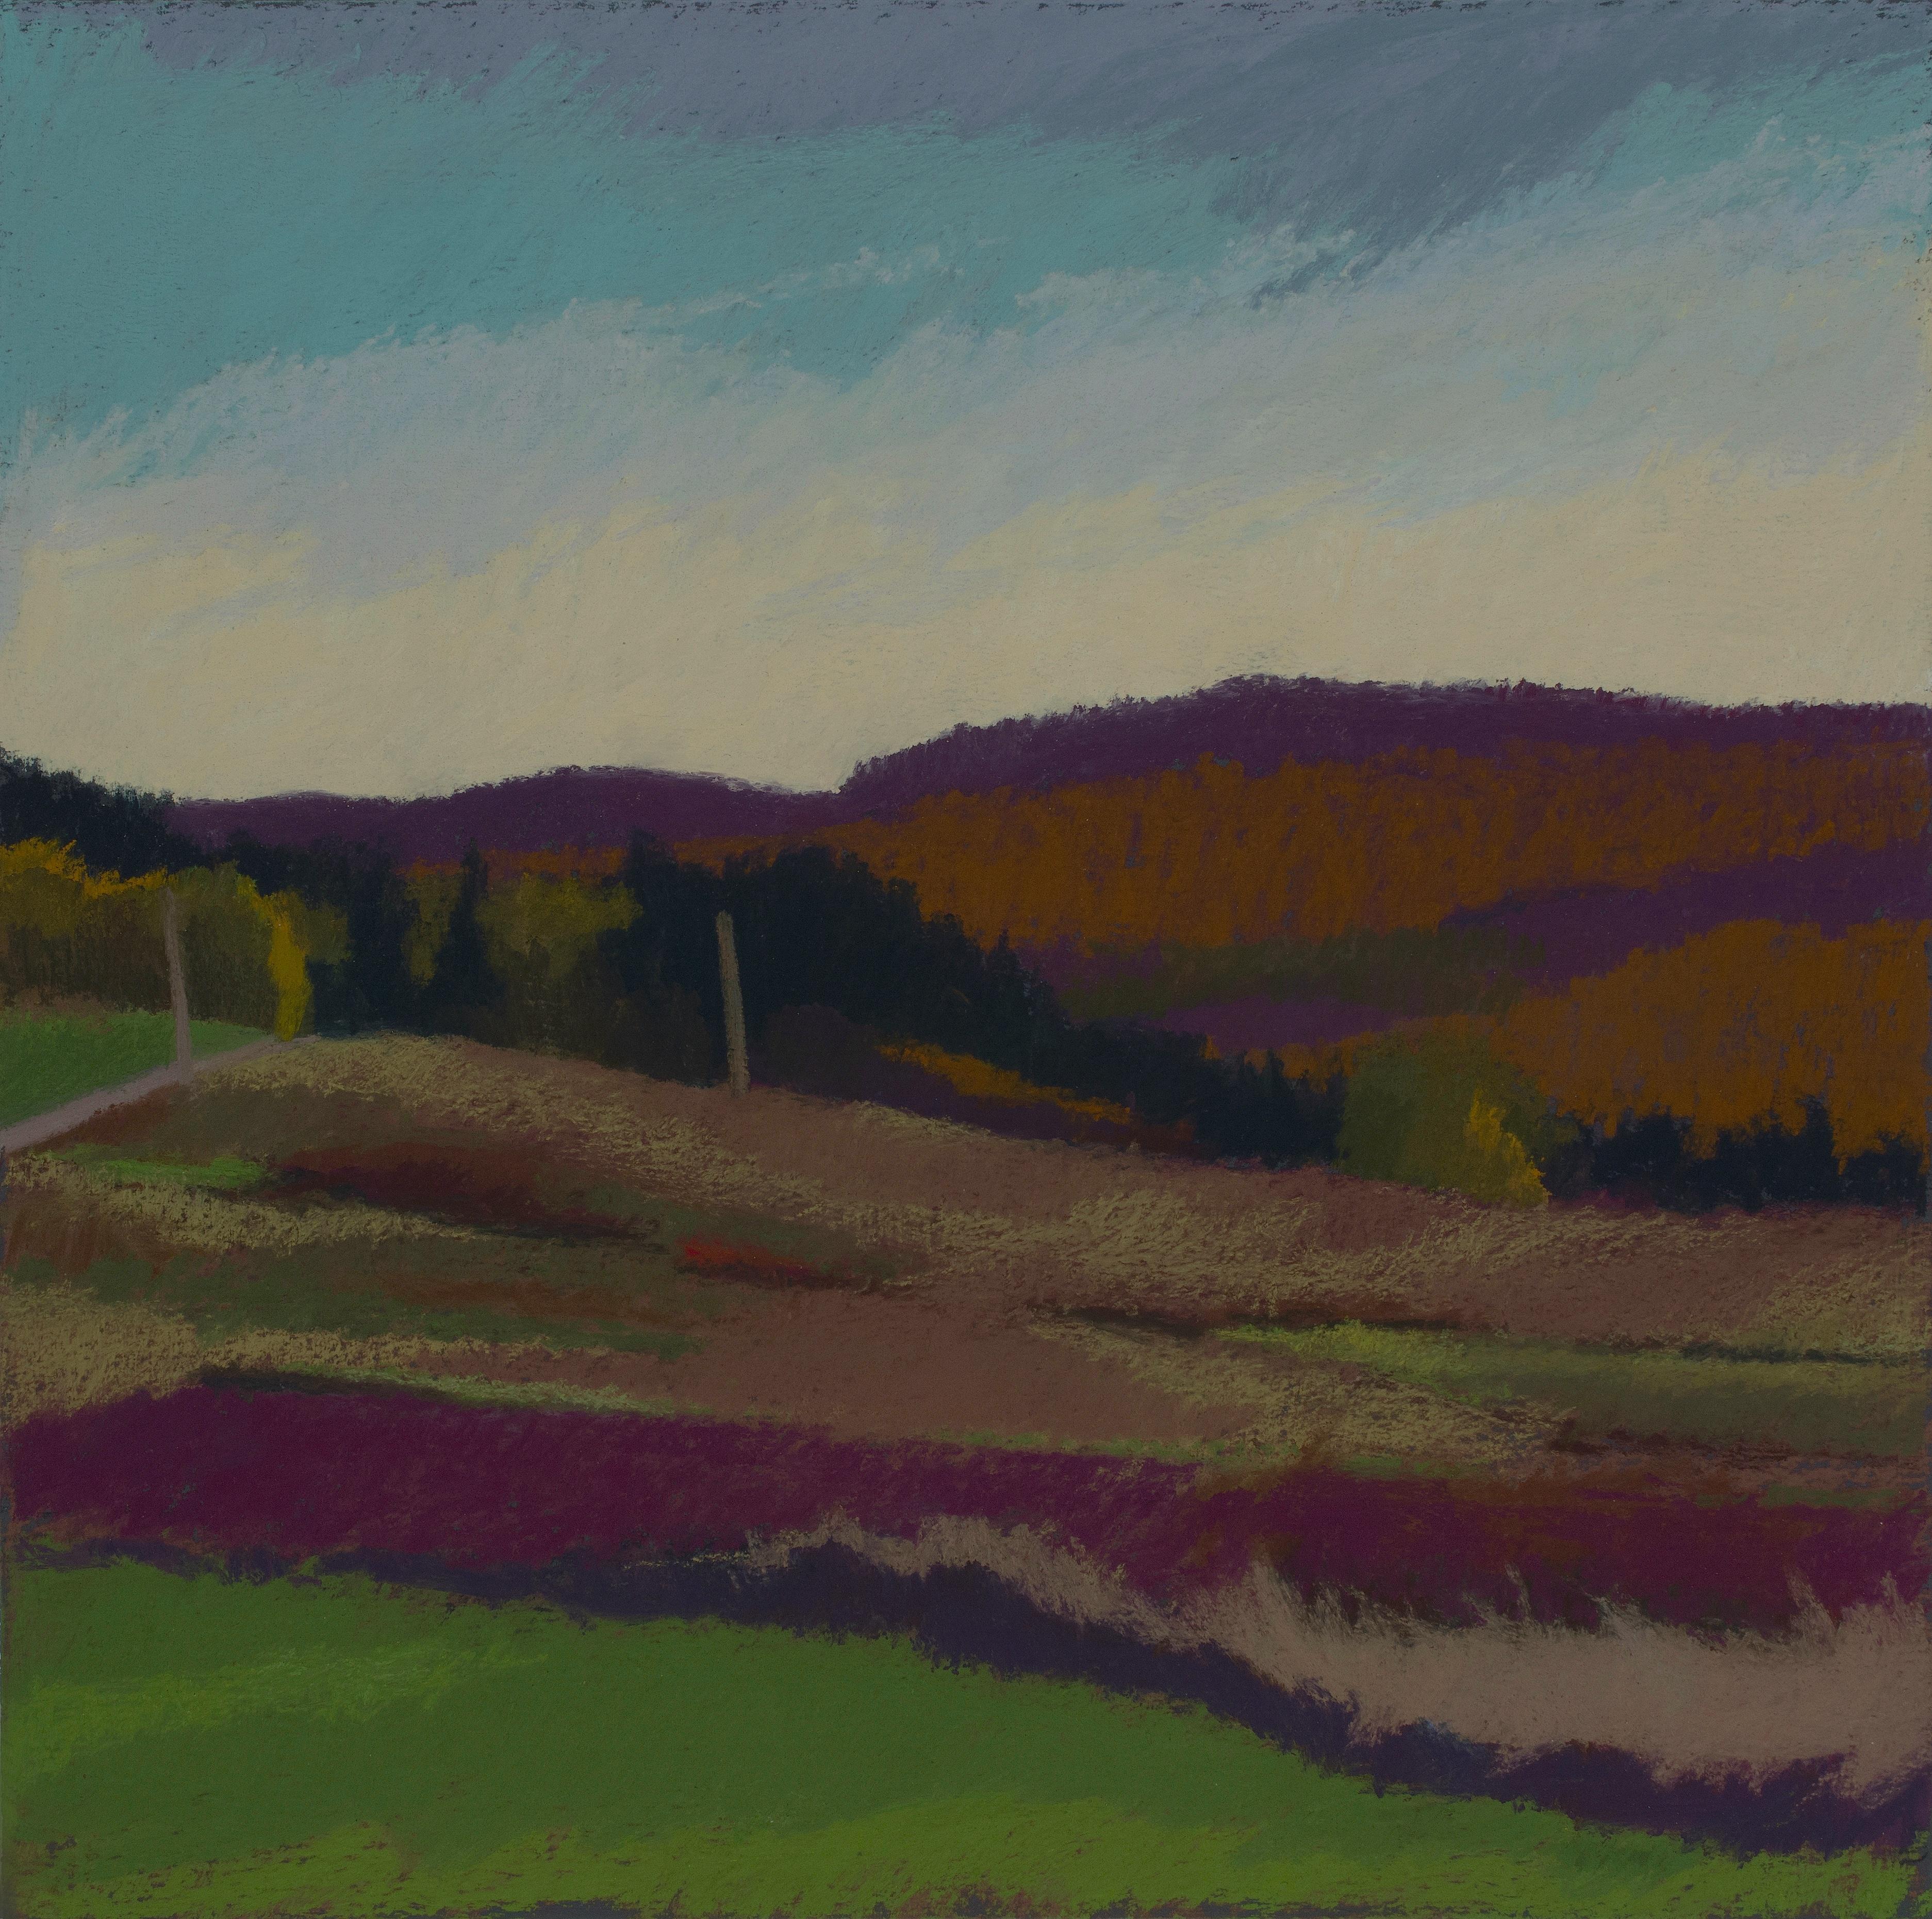 Buckwheat No. 12- The Twang Shall Meet, purple and orange